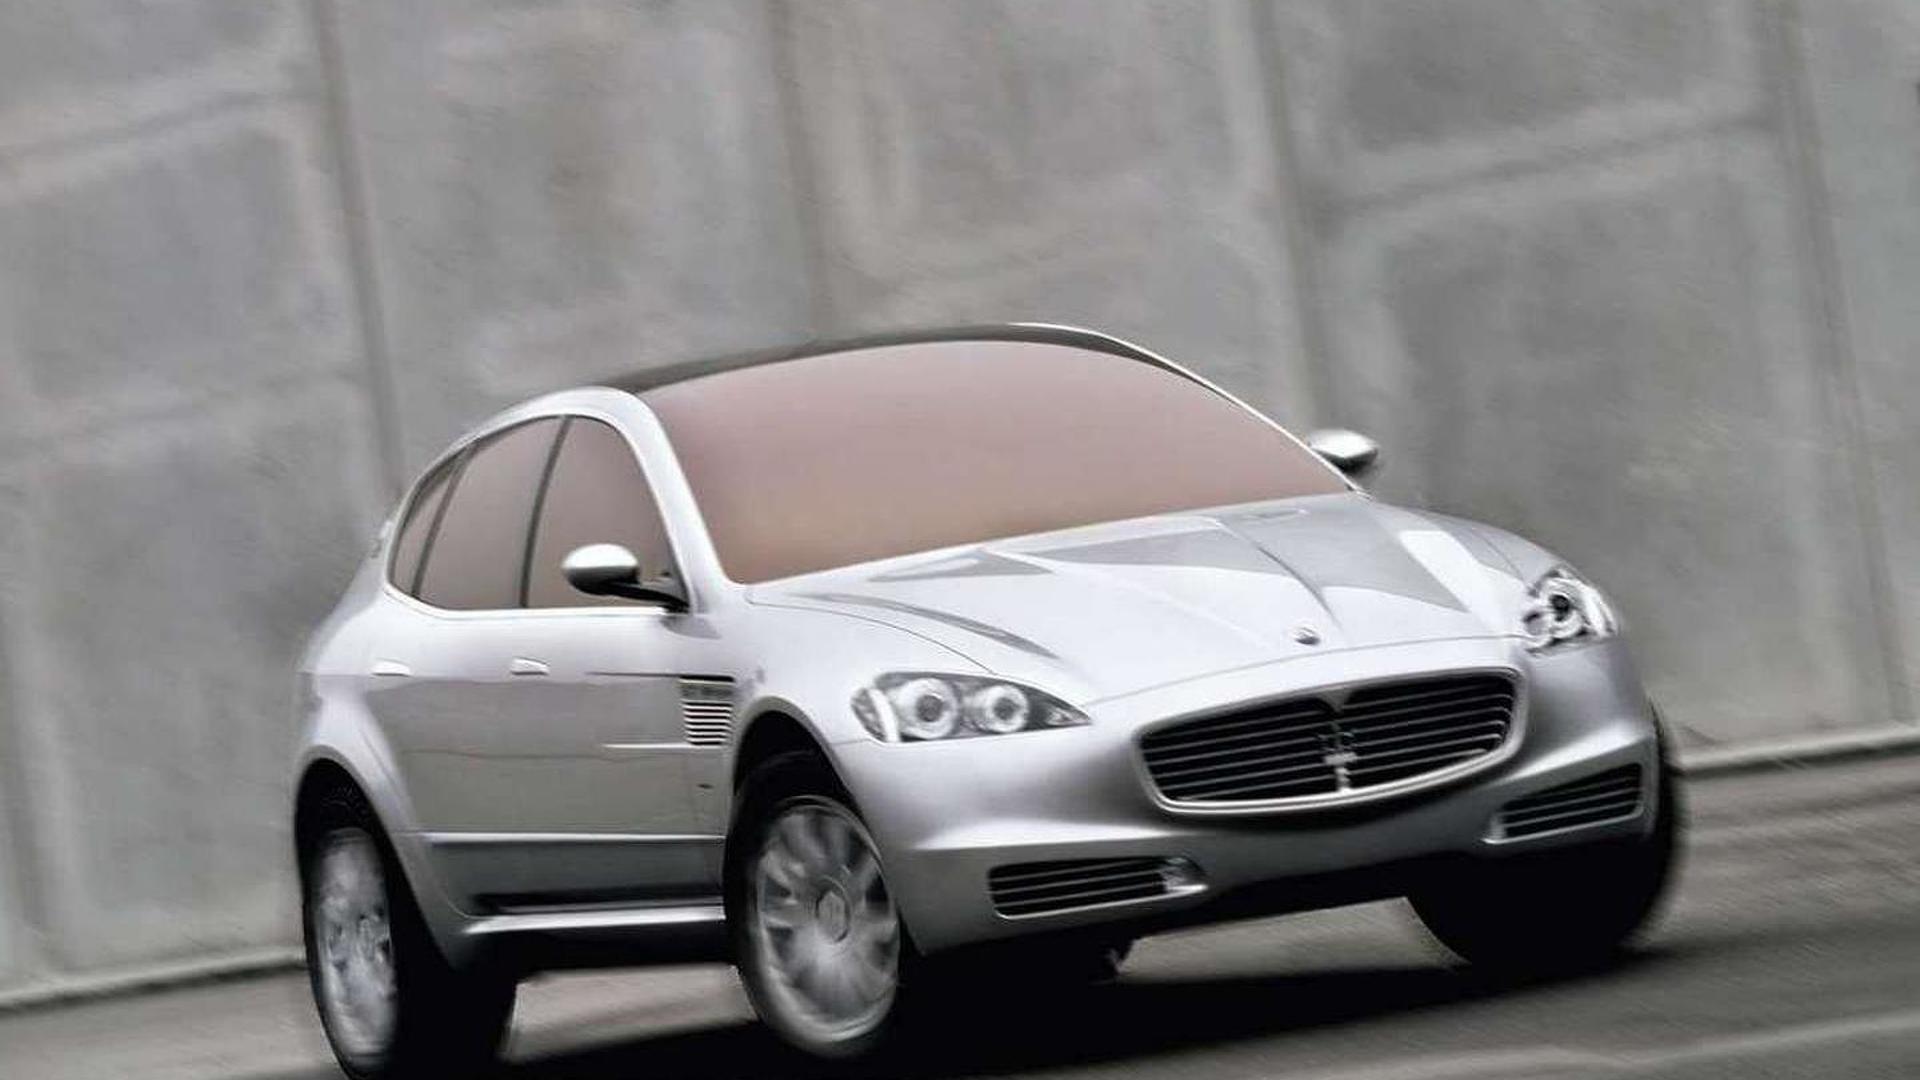 https://icdn-2.motor1.com/images/mgl/Ew0nz/s1/2010-215509-maserati-kubang-gt-wagon-concept-20031.jpg